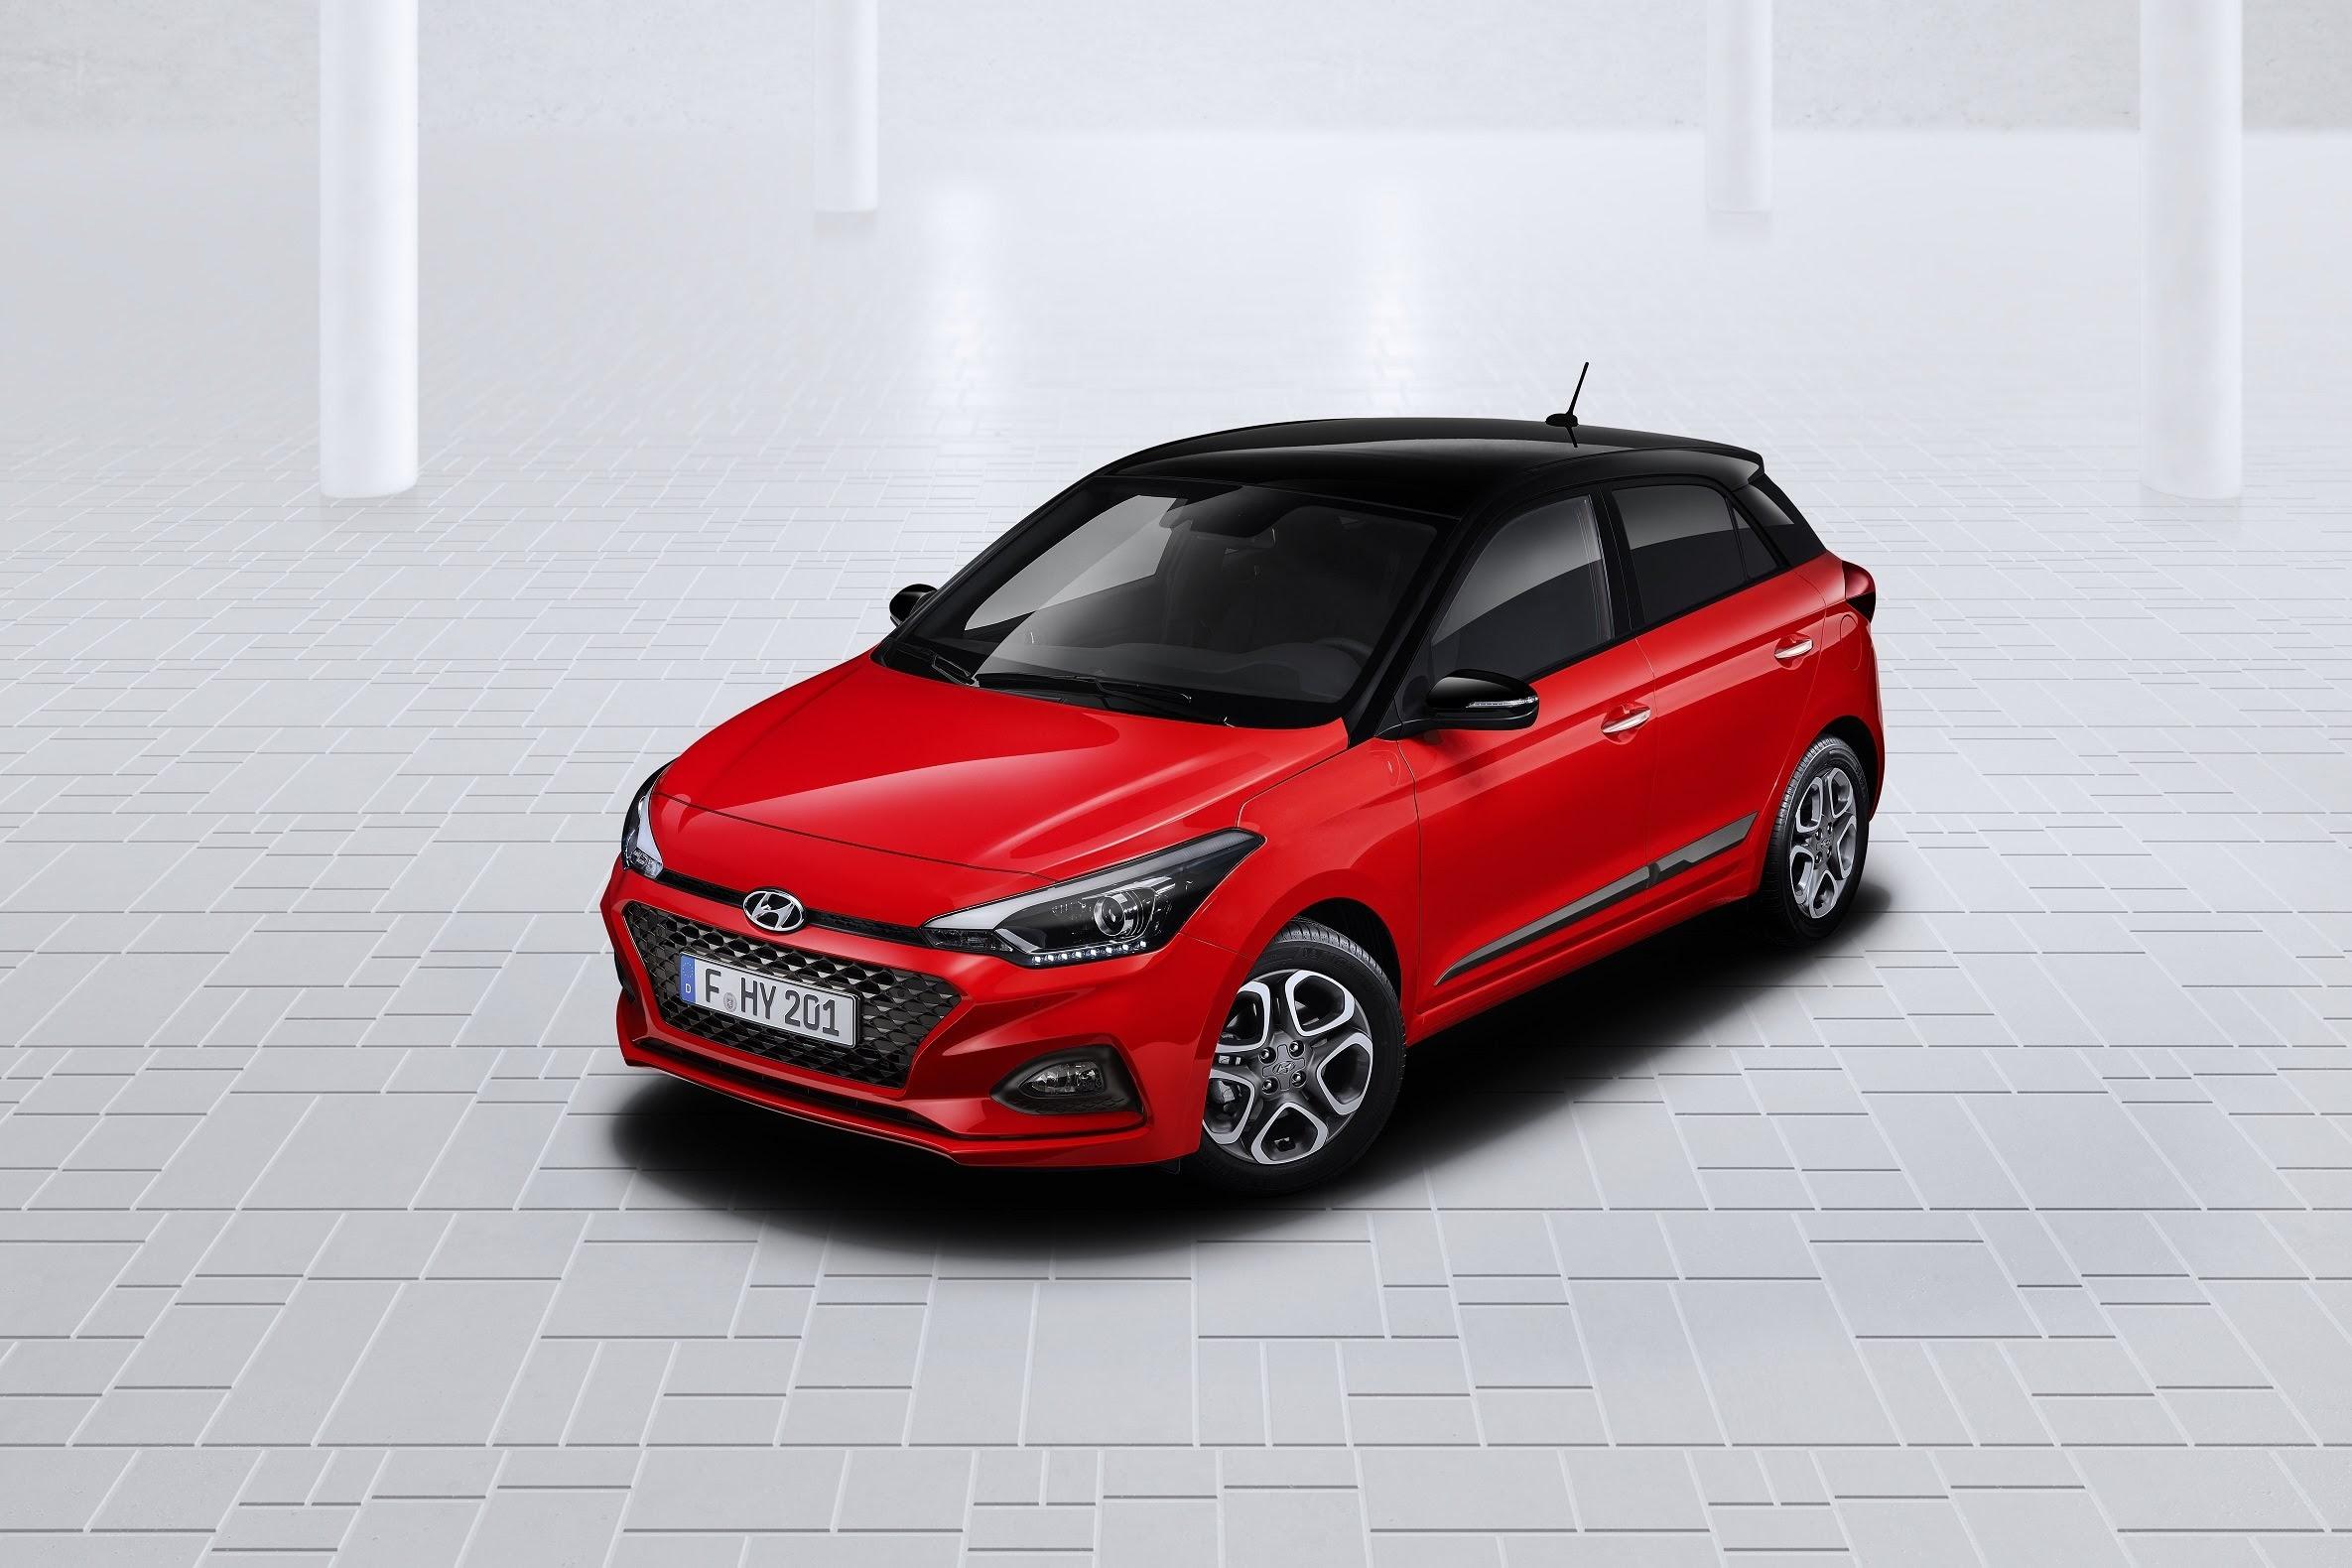 PwMUaUYiPftm7C5iPCU7l1t53USstDTu5dnUNhs1ICaGqs35u3oVDh6630x44Lxs4TYjY3tcyN74ksvpSBGQv5Fum3fWen6S5hwtXvZwsTlBXDAuSD7Z8F npHvx 6yym7QIKfBU4Q=w2400 - Hyundai renueva la gama i20